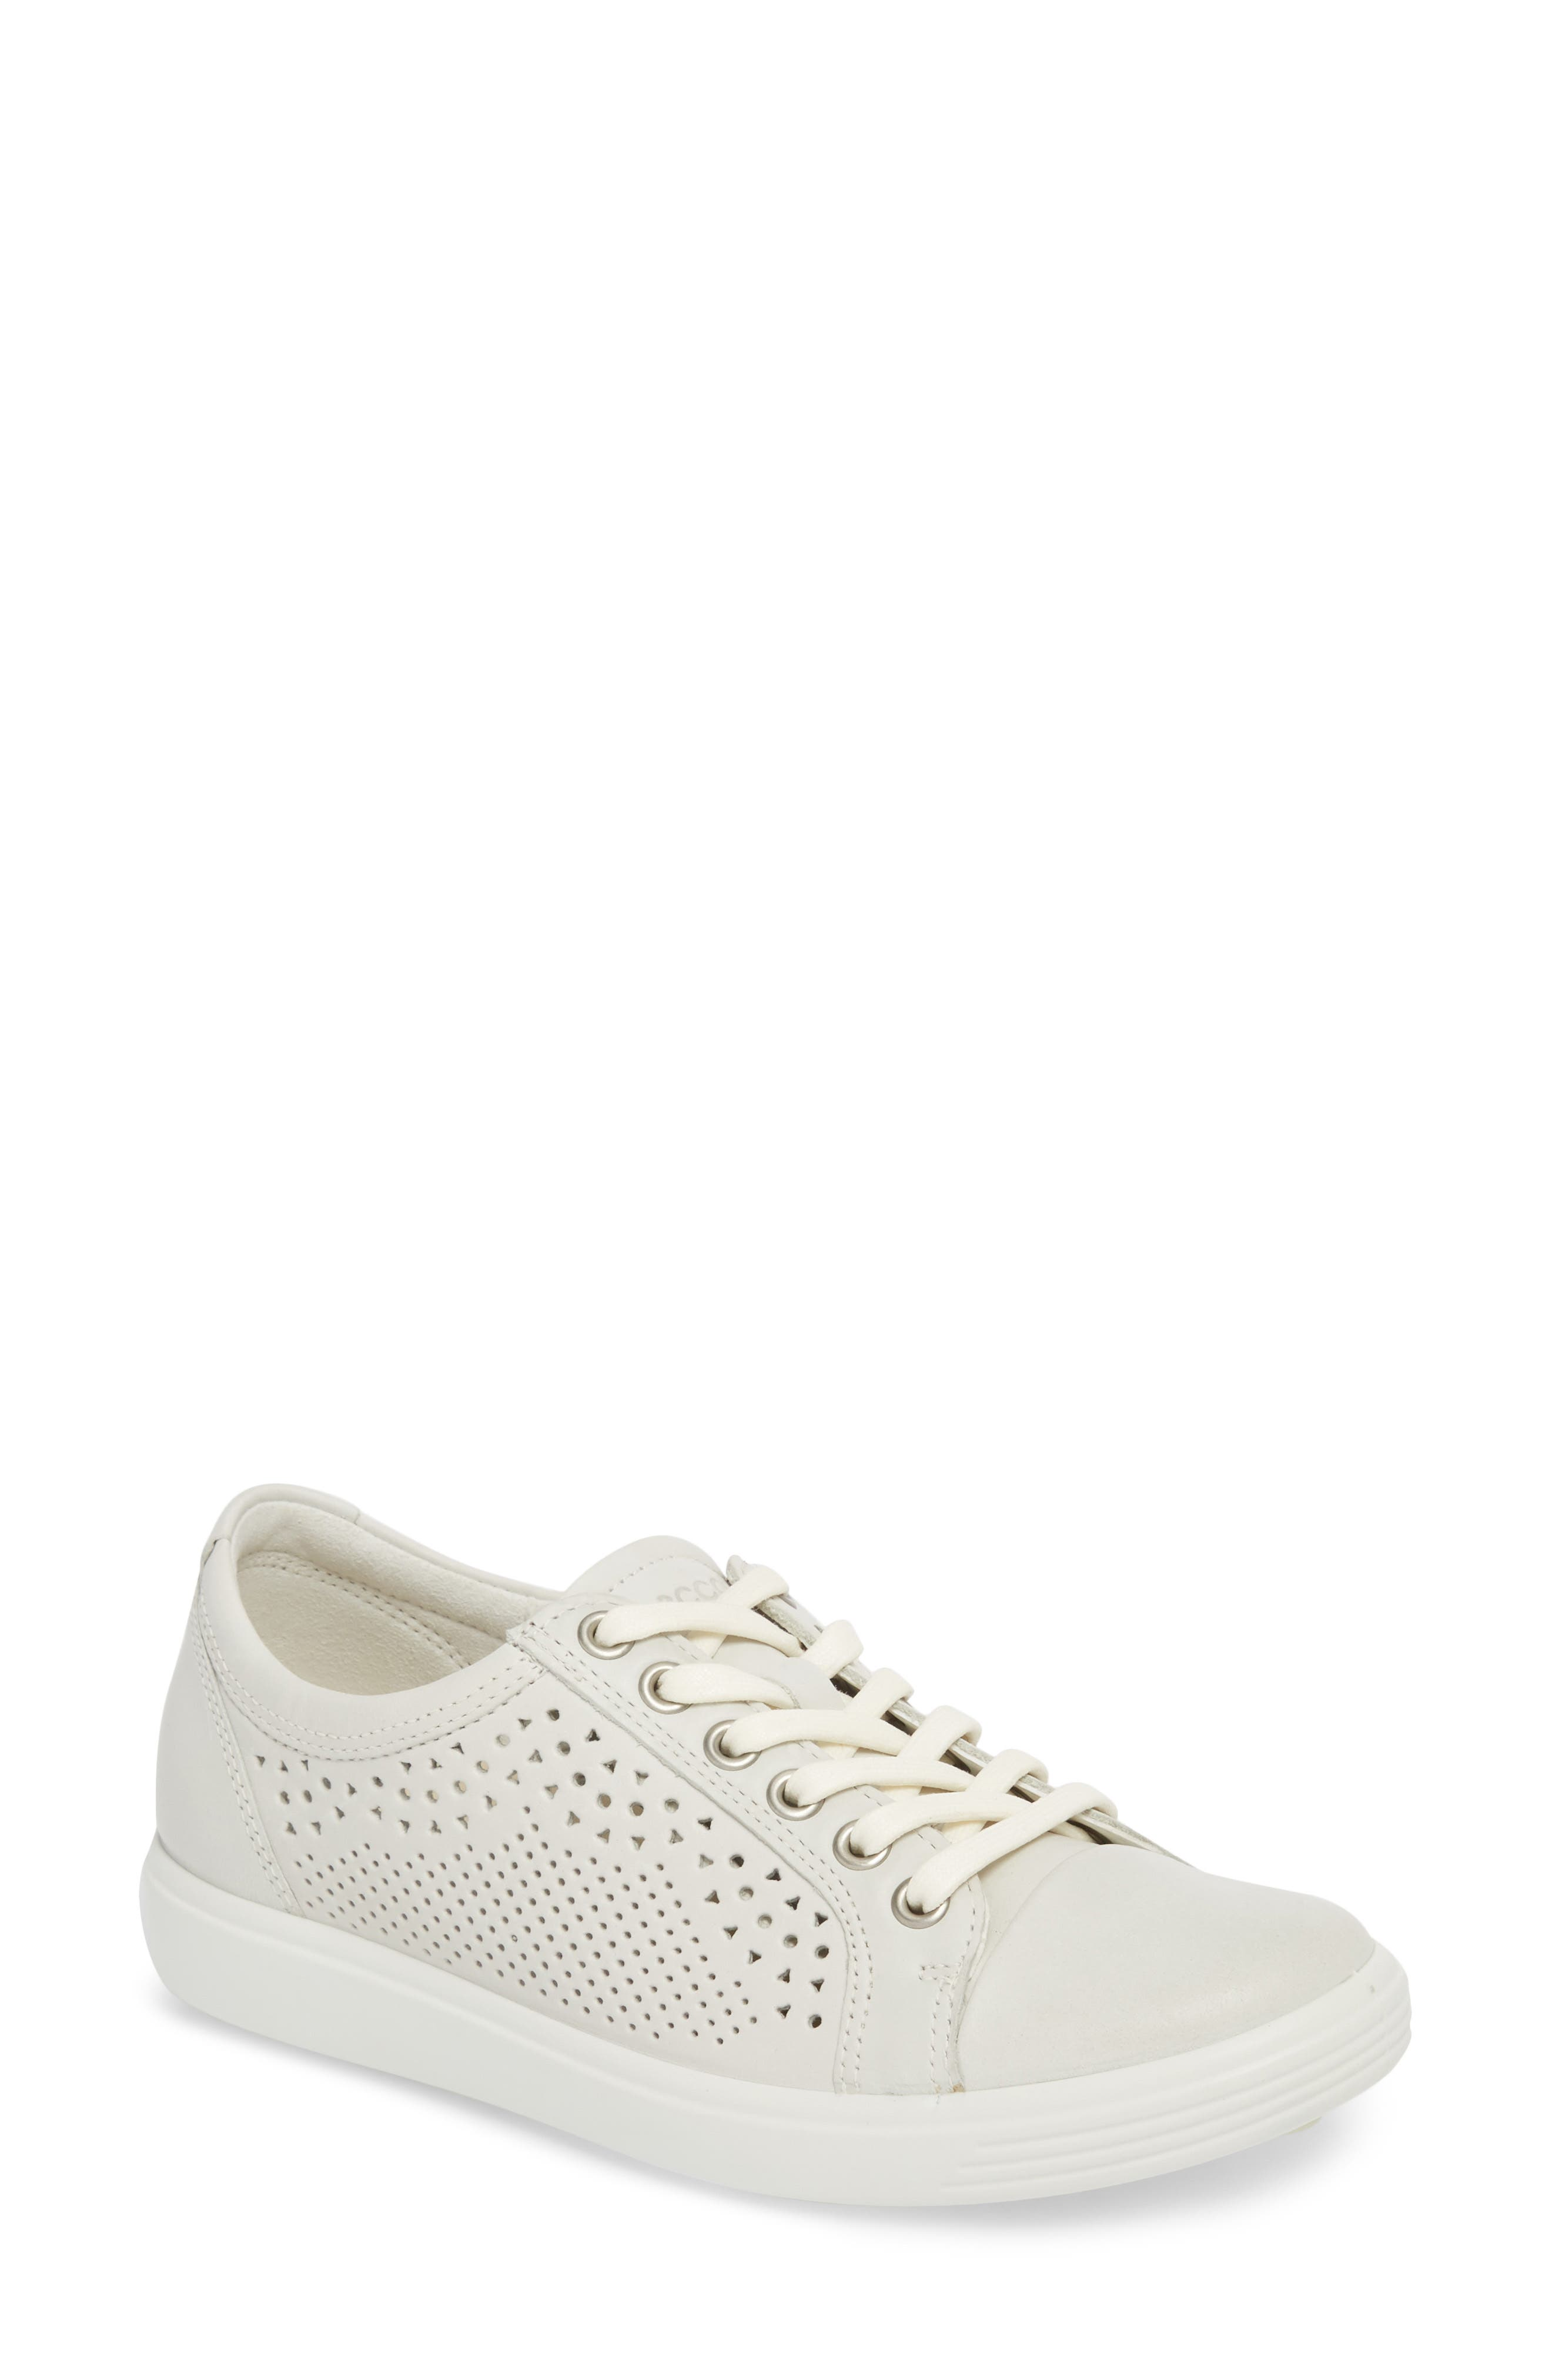 Main Image - ECCO Soft 7 Sneaker (Women)